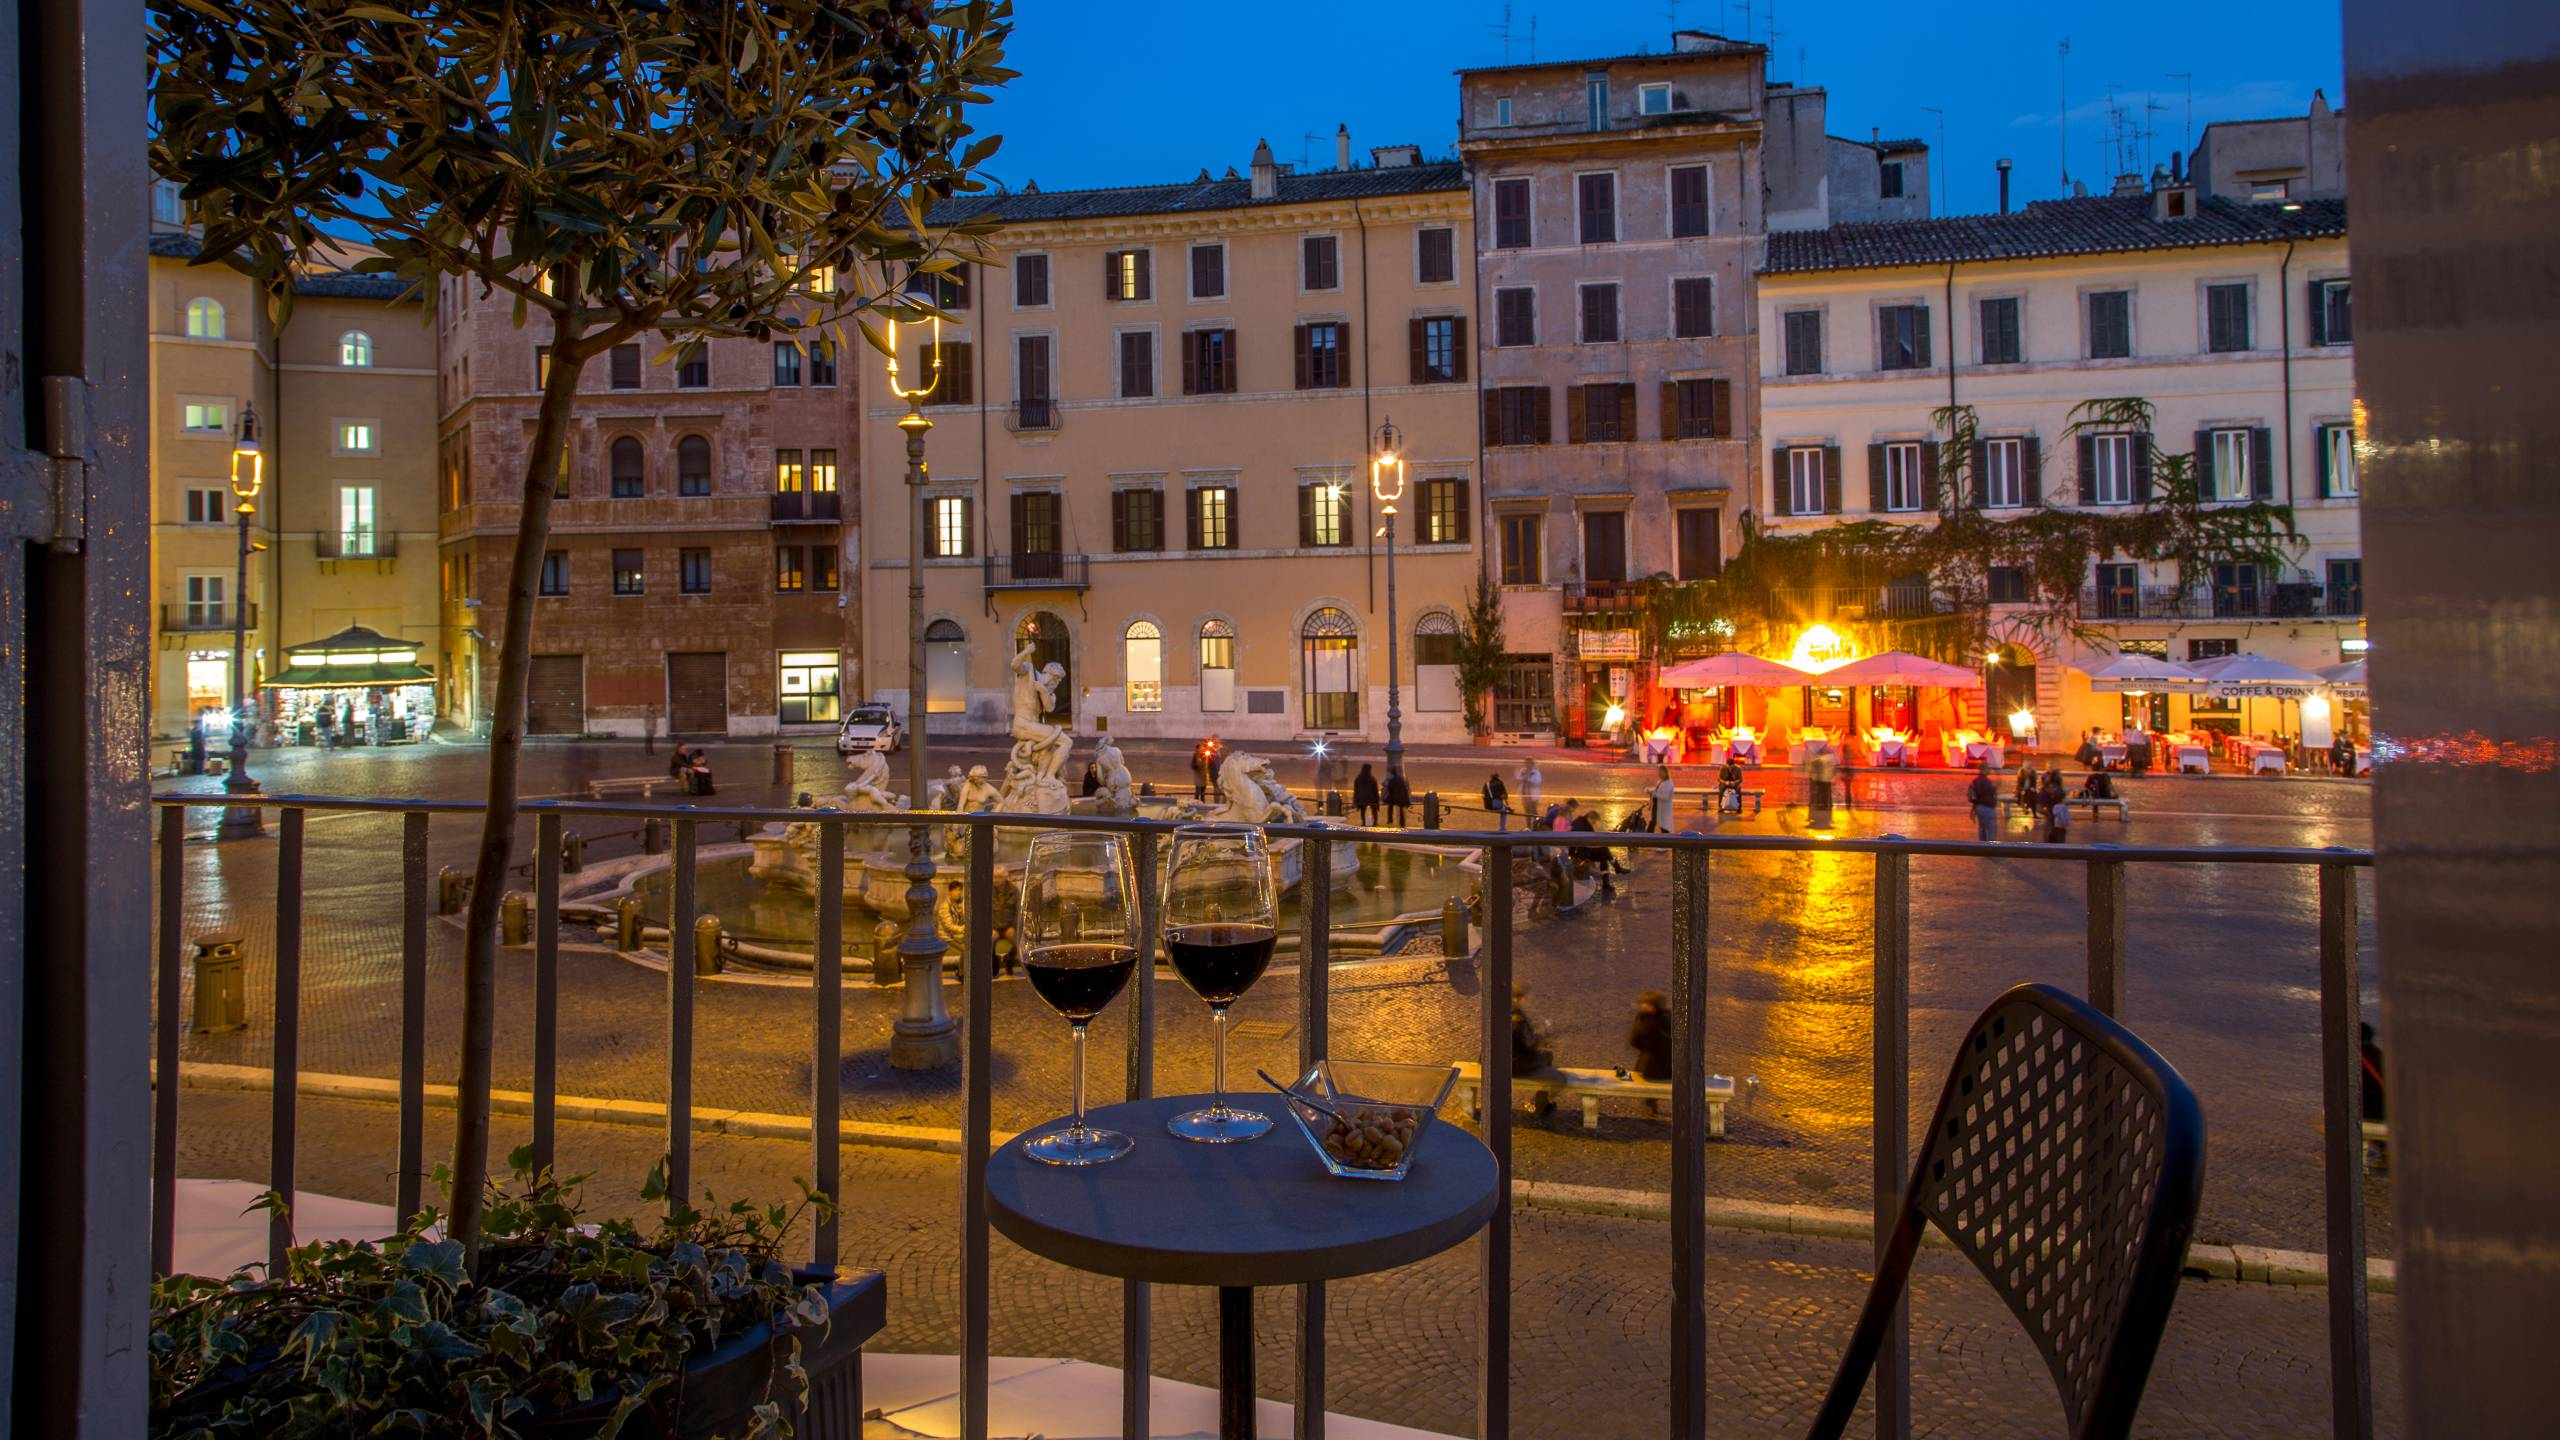 palazzo-de-cupis-rome-navona-square28